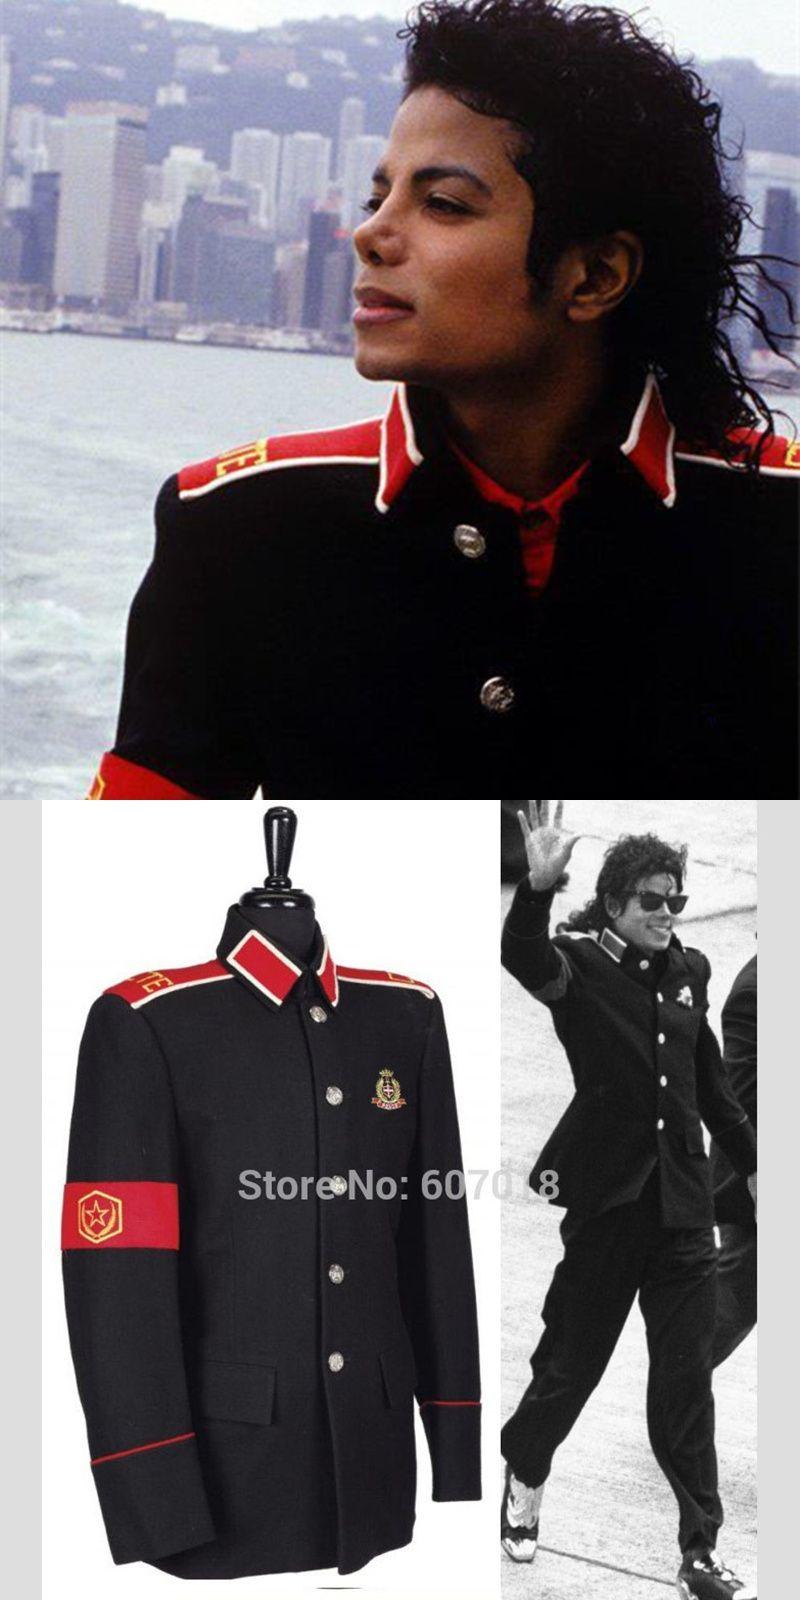 d89b62bbdd1 Rare Classic MJ MICHAEL JACKSON Costume Black Informal Military CTE Woolen  Clothing Jacket Outwear